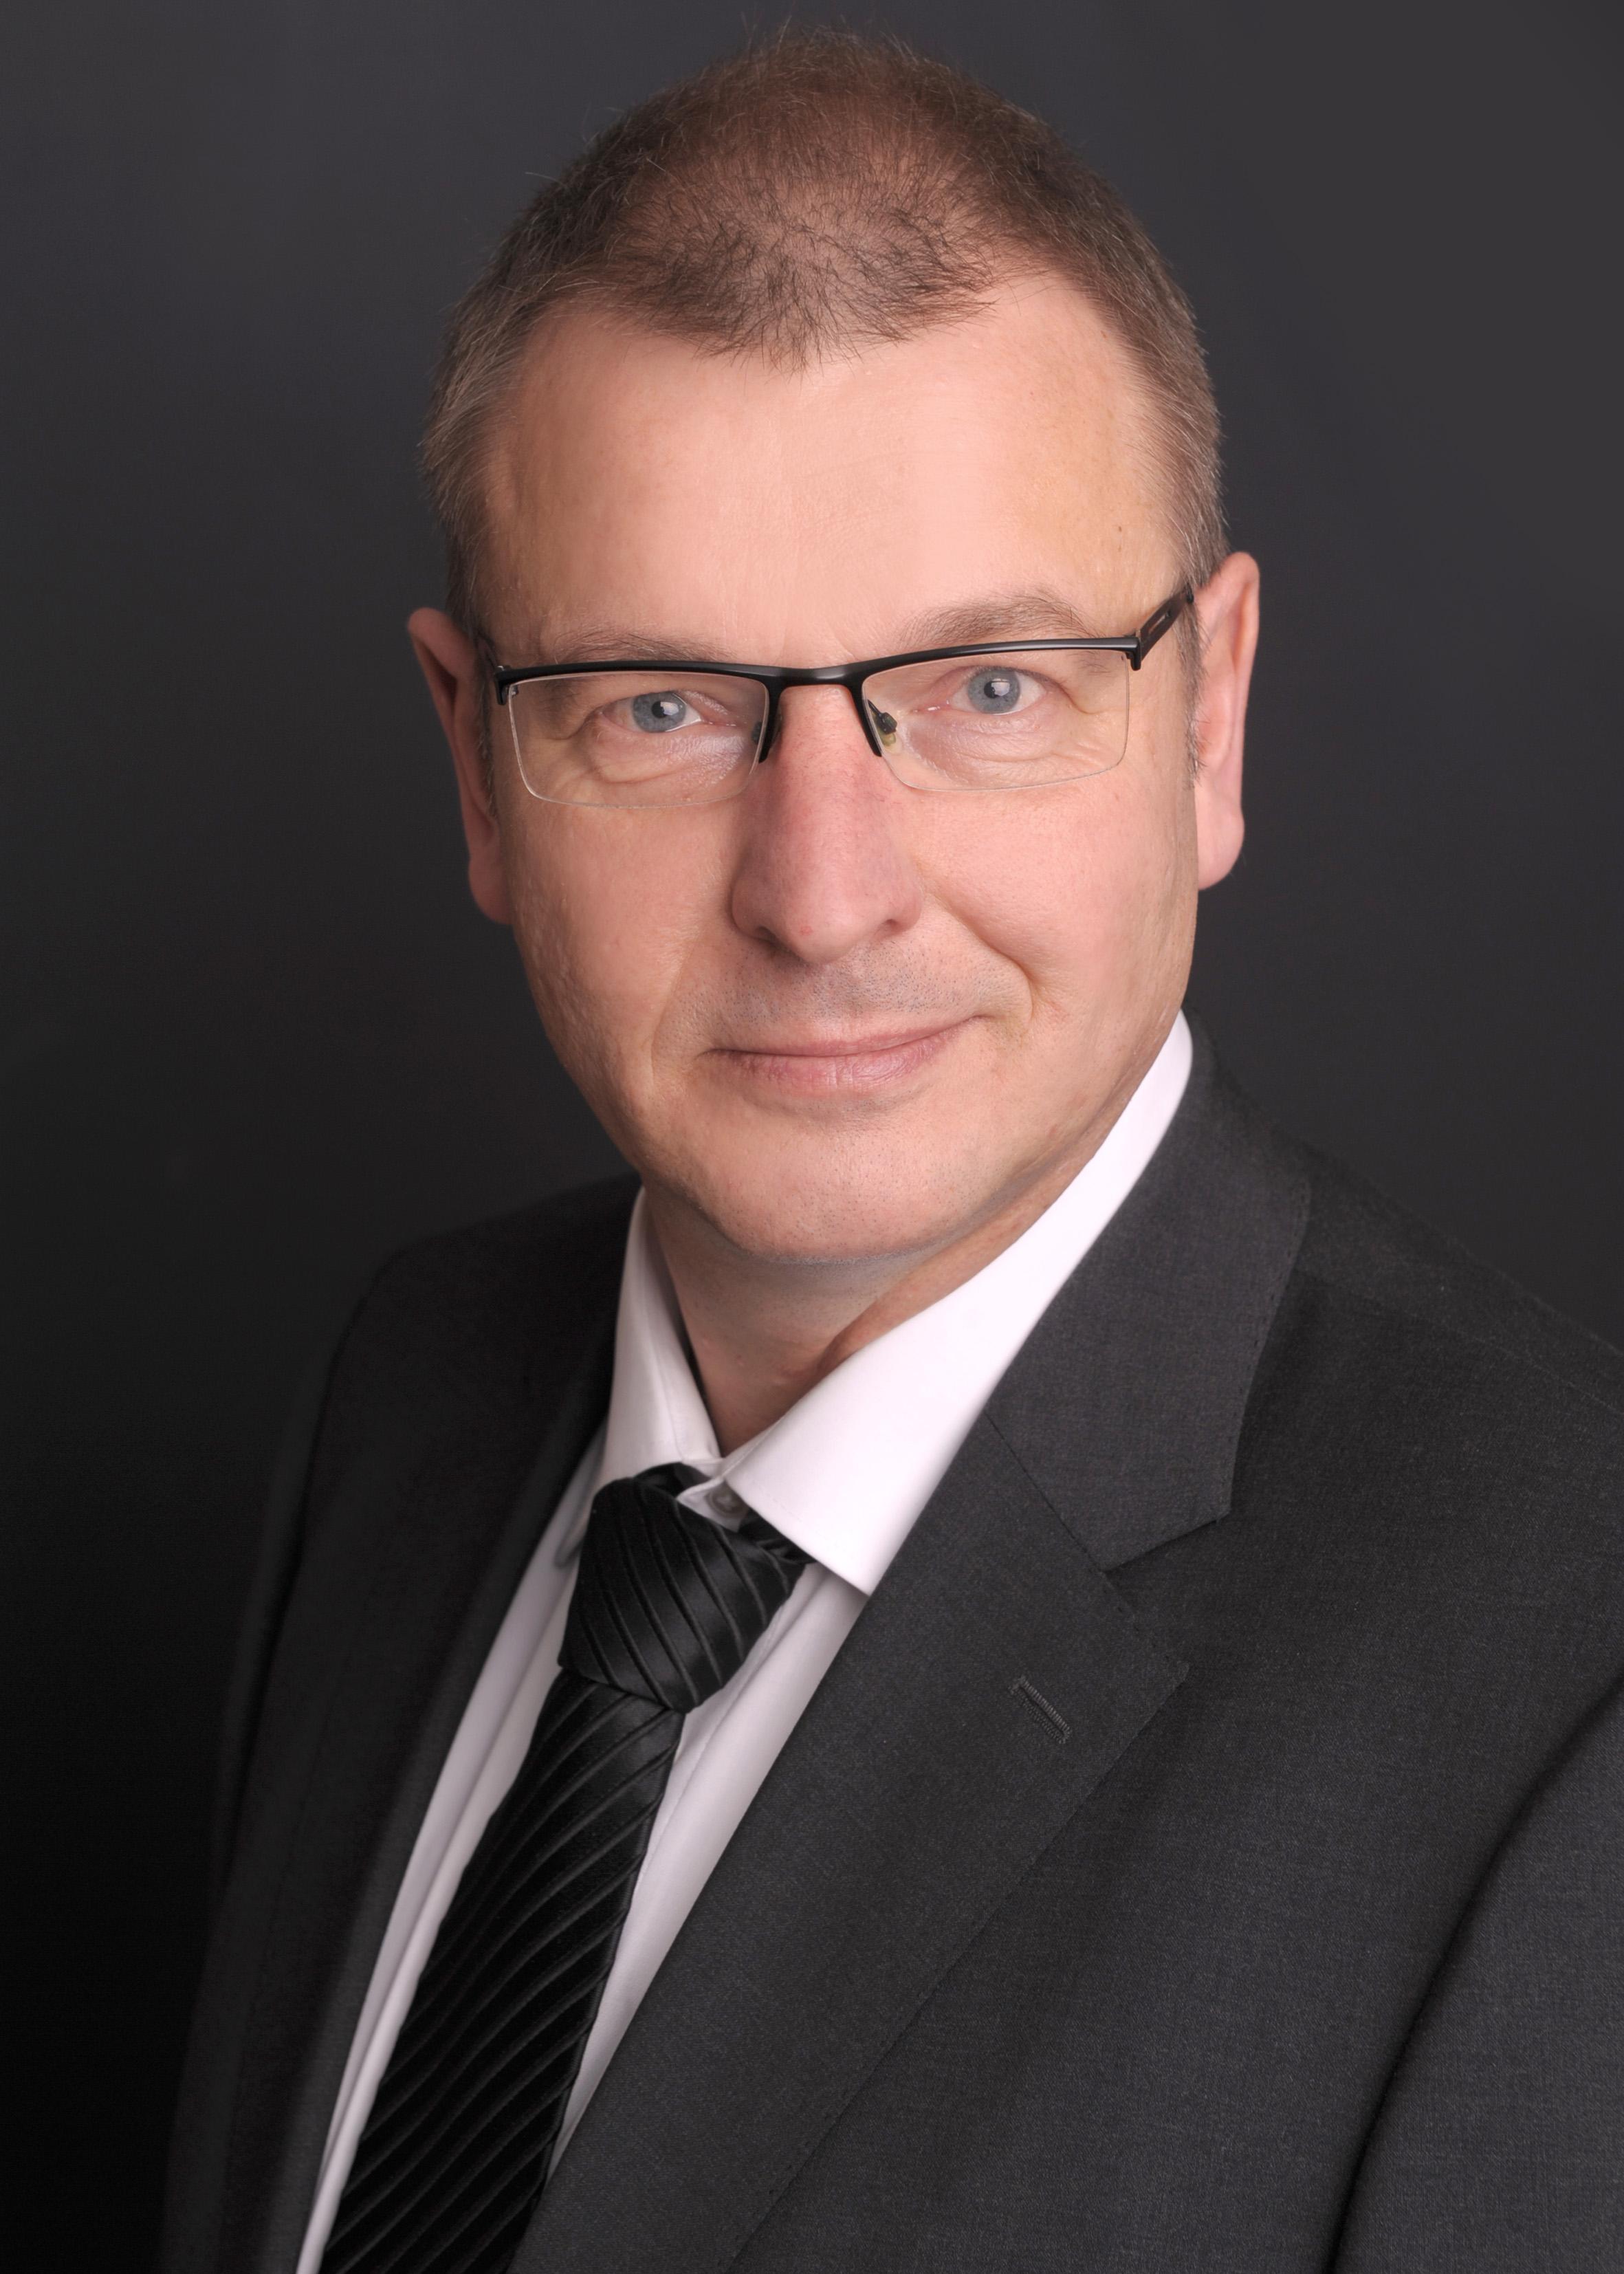 Dirk Schomacher